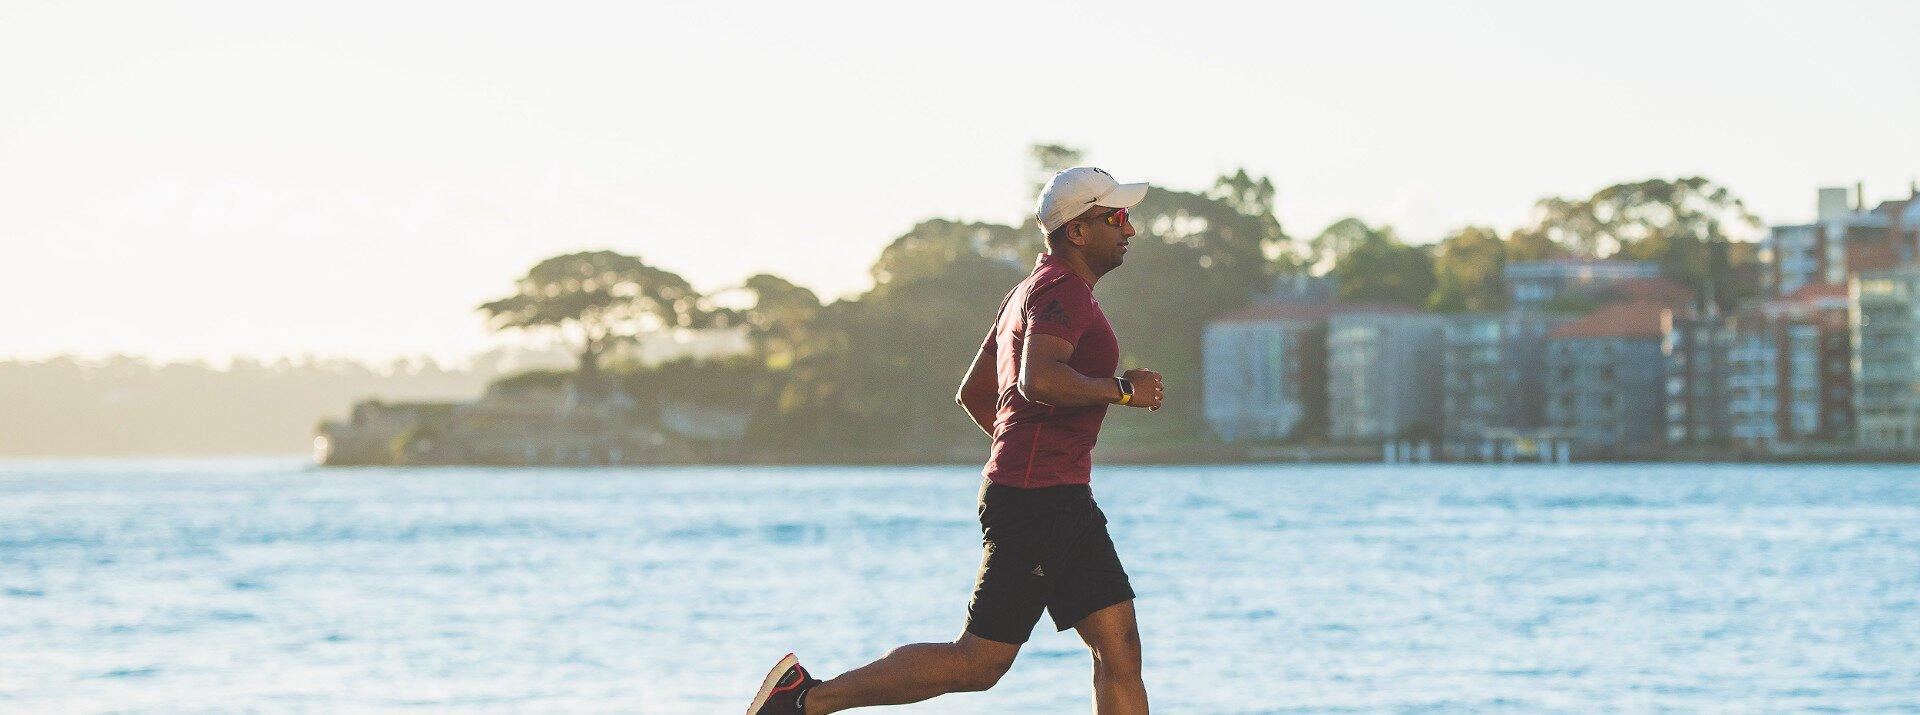 Man running near body of water